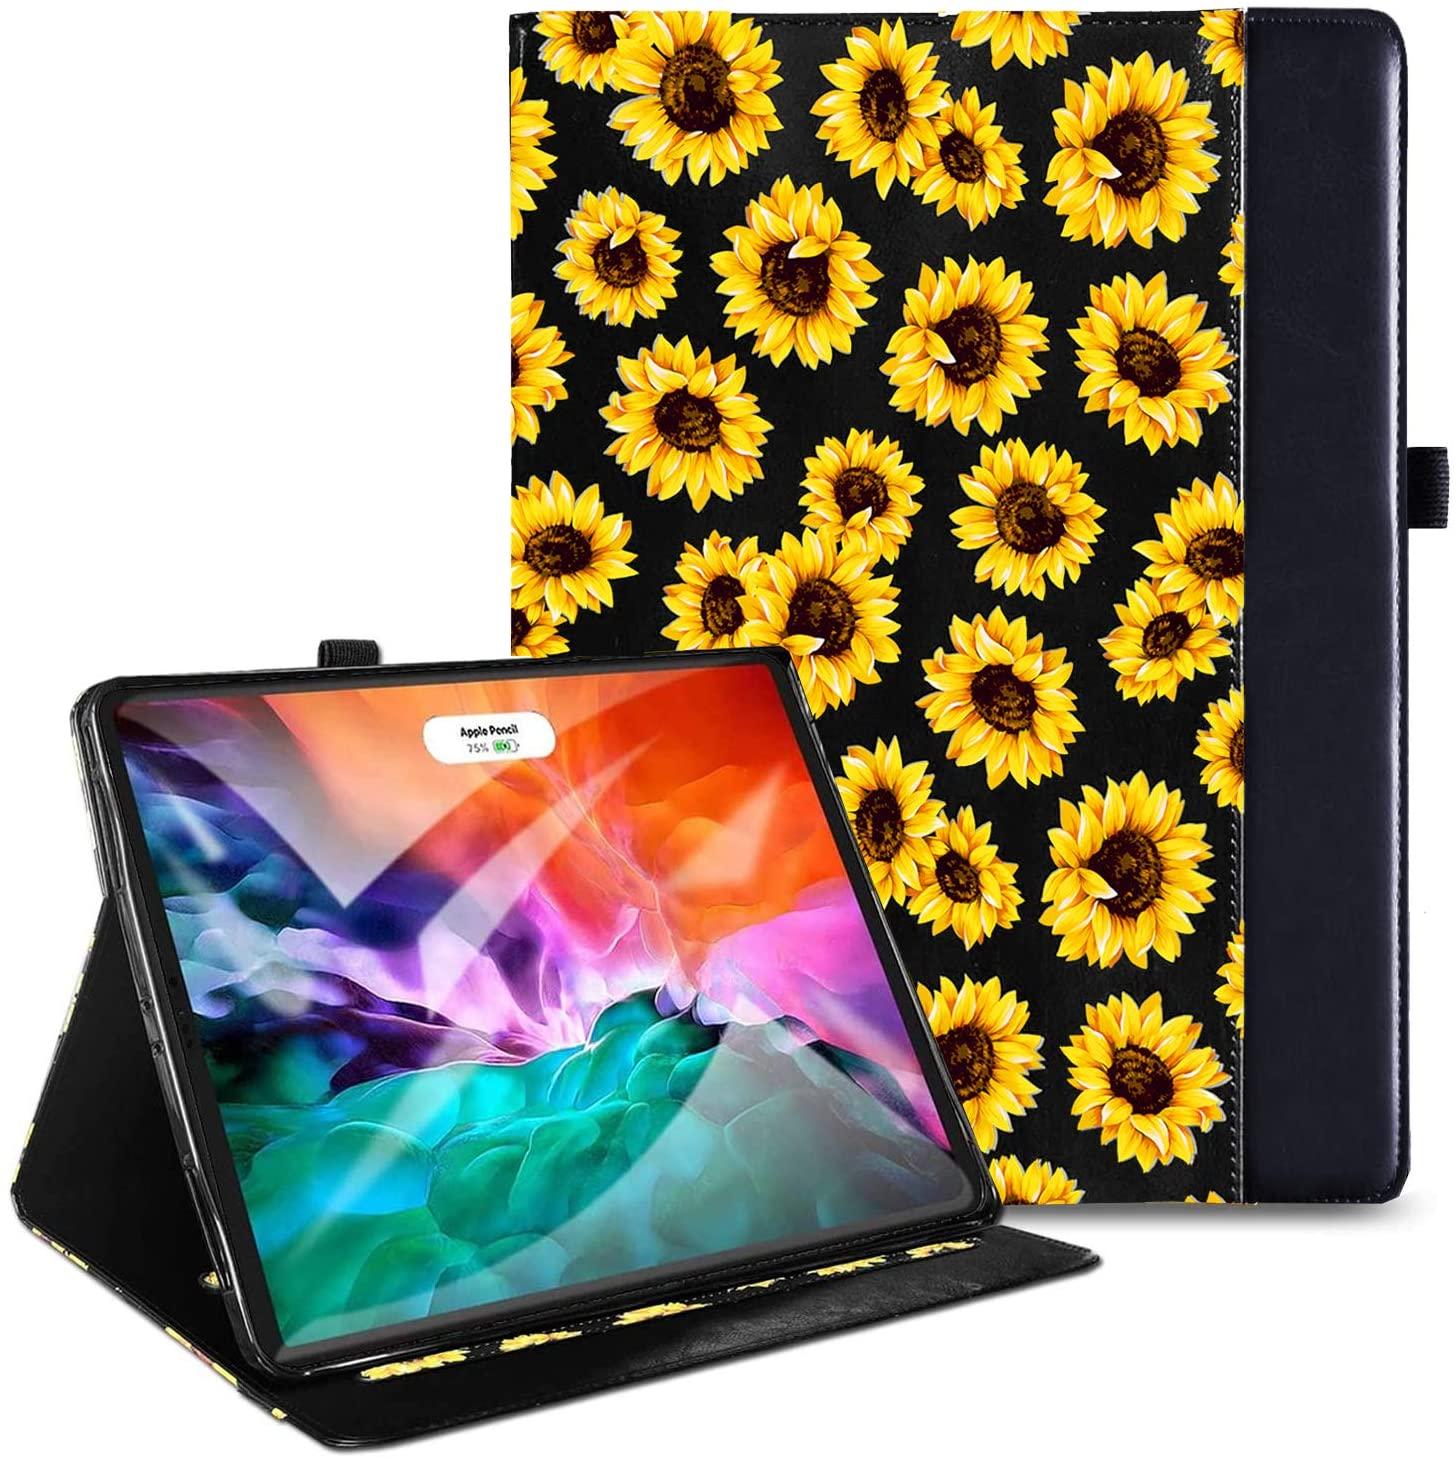 J.west Case for iPad Pro 12.9